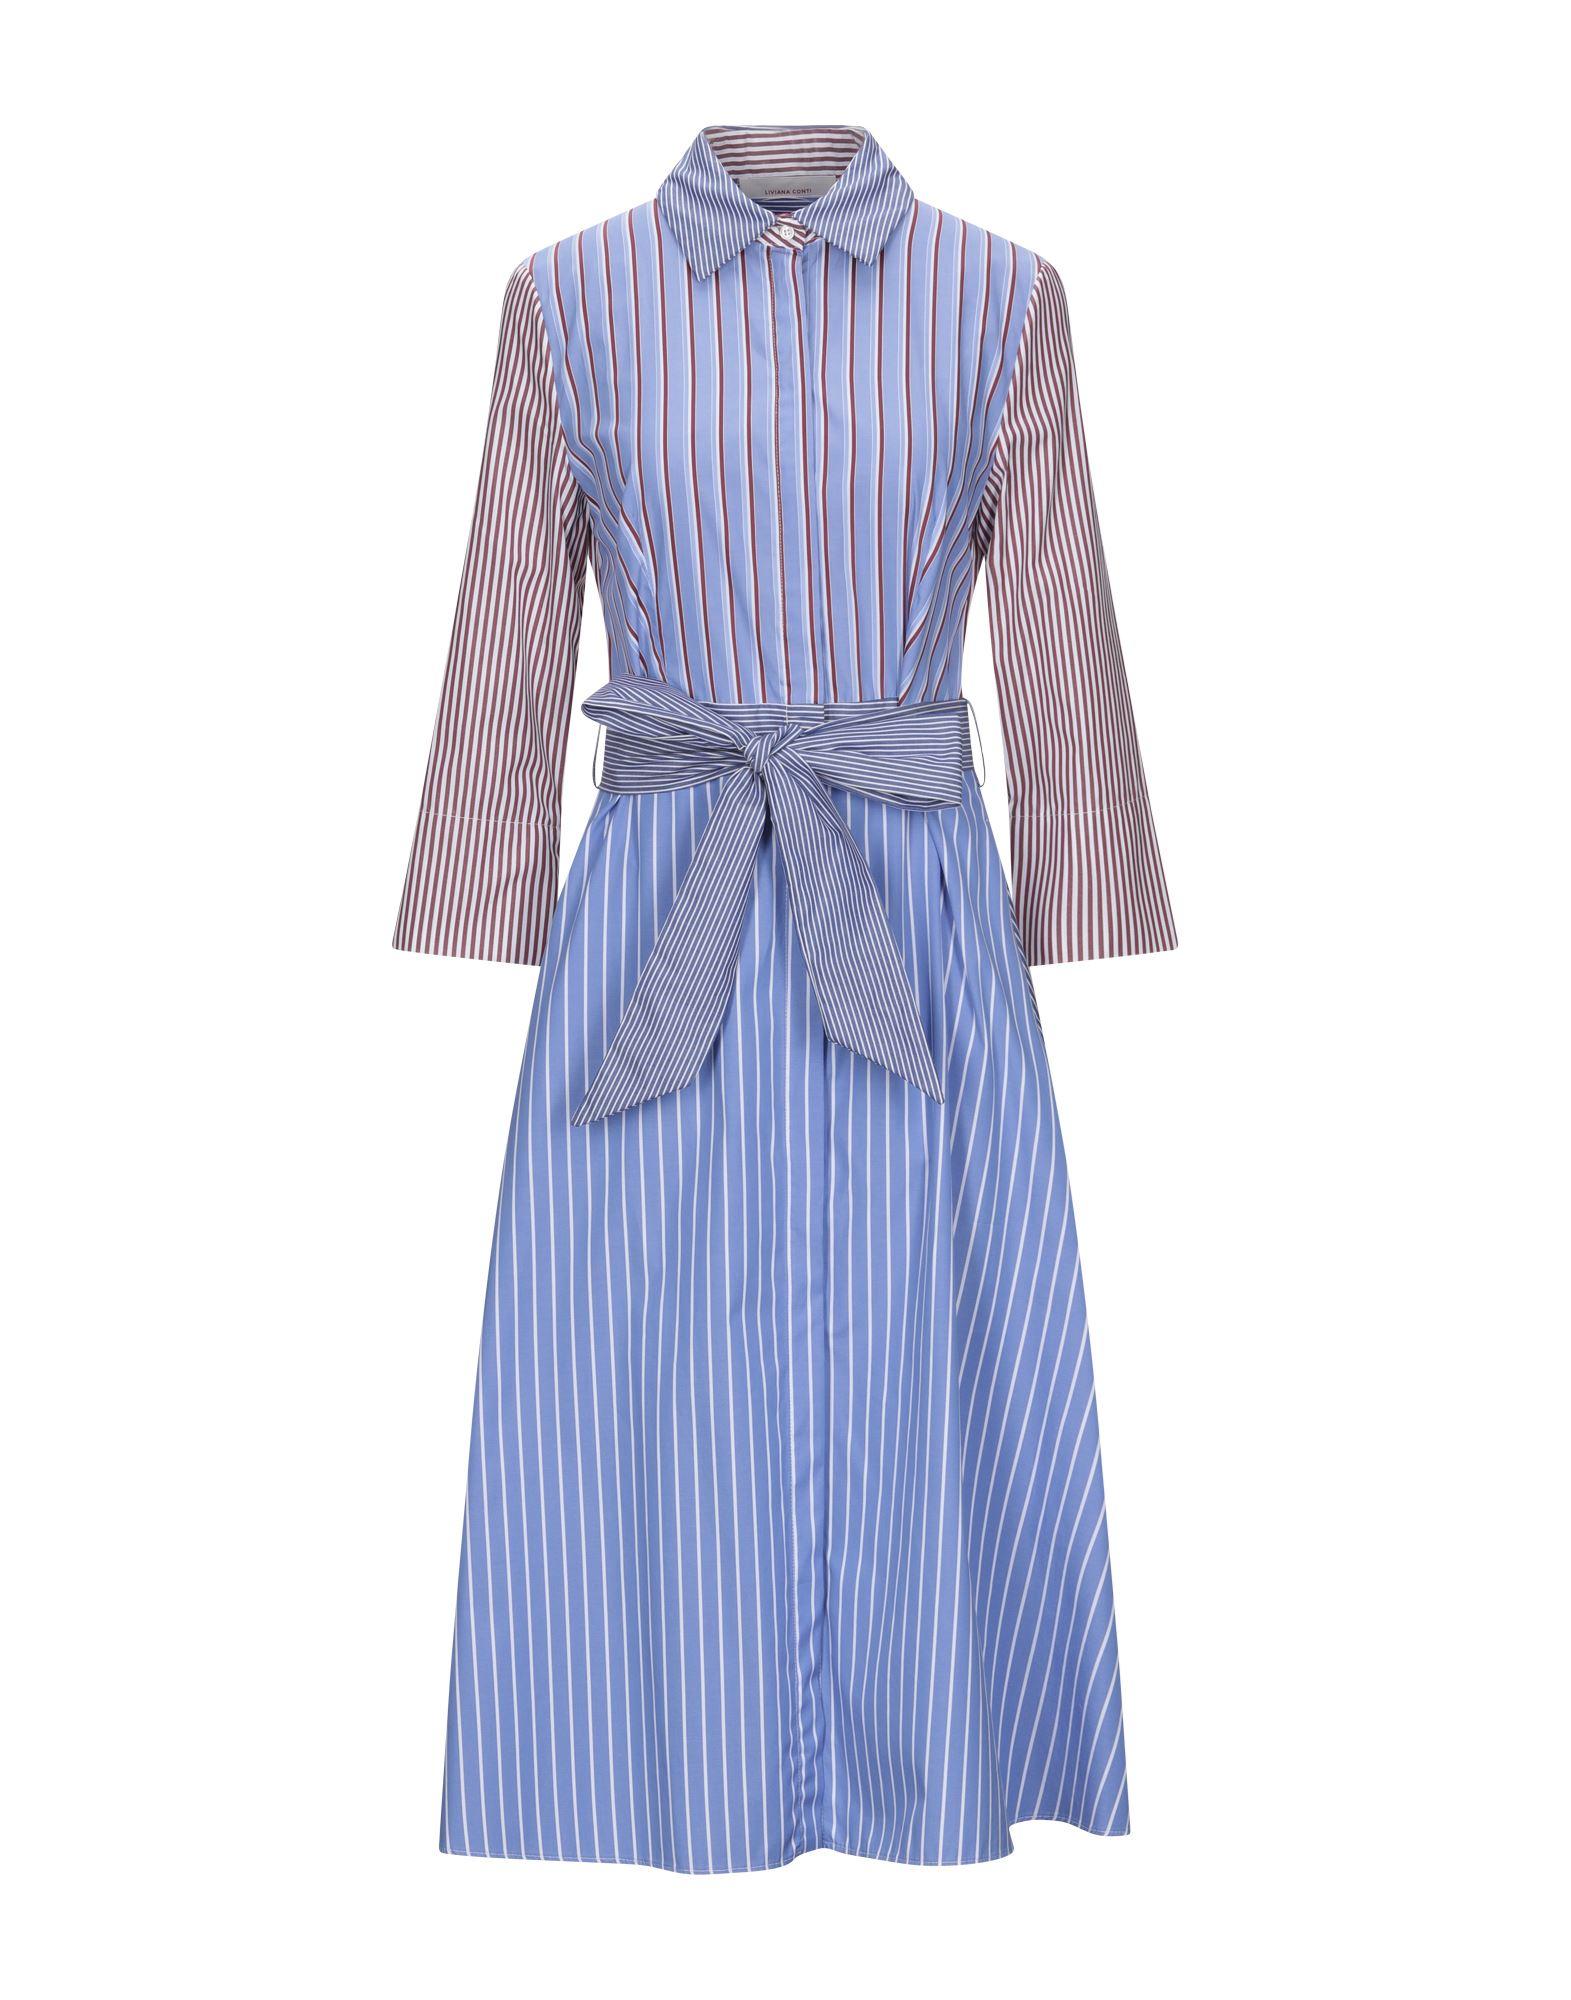 LIVIANA CONTI Платье длиной 3/4 vionnet платье длиной 3 4